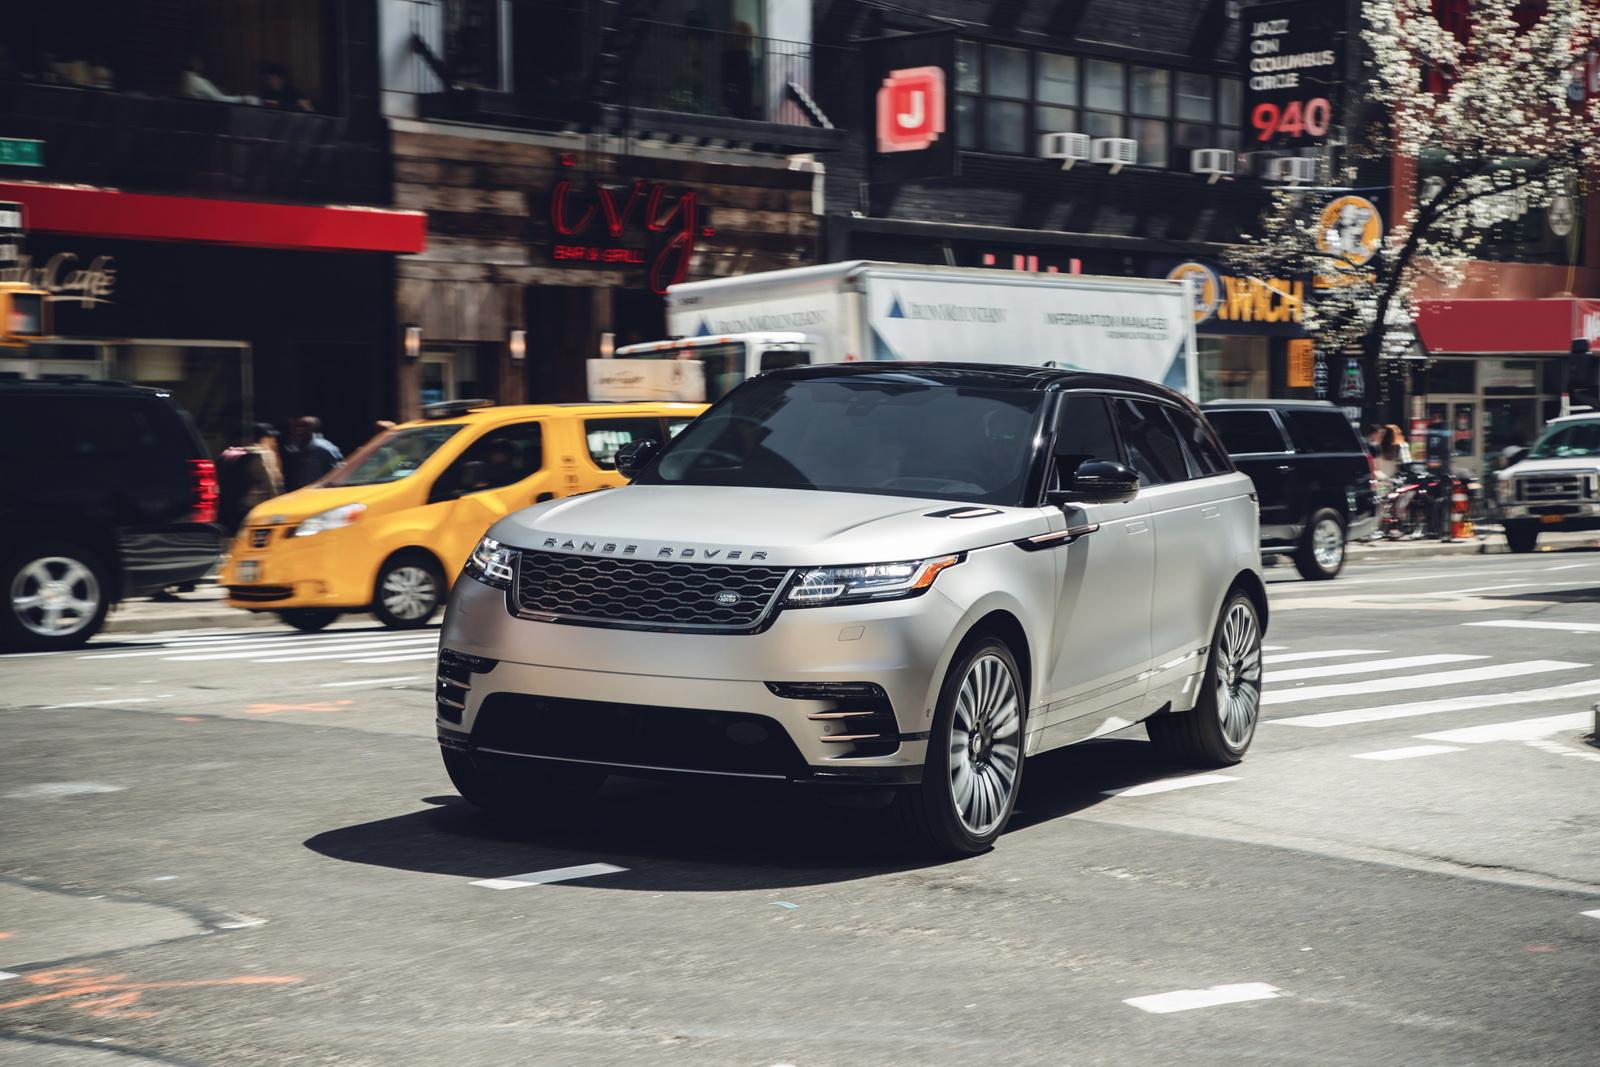 range rover velar 2018 ra măt vn